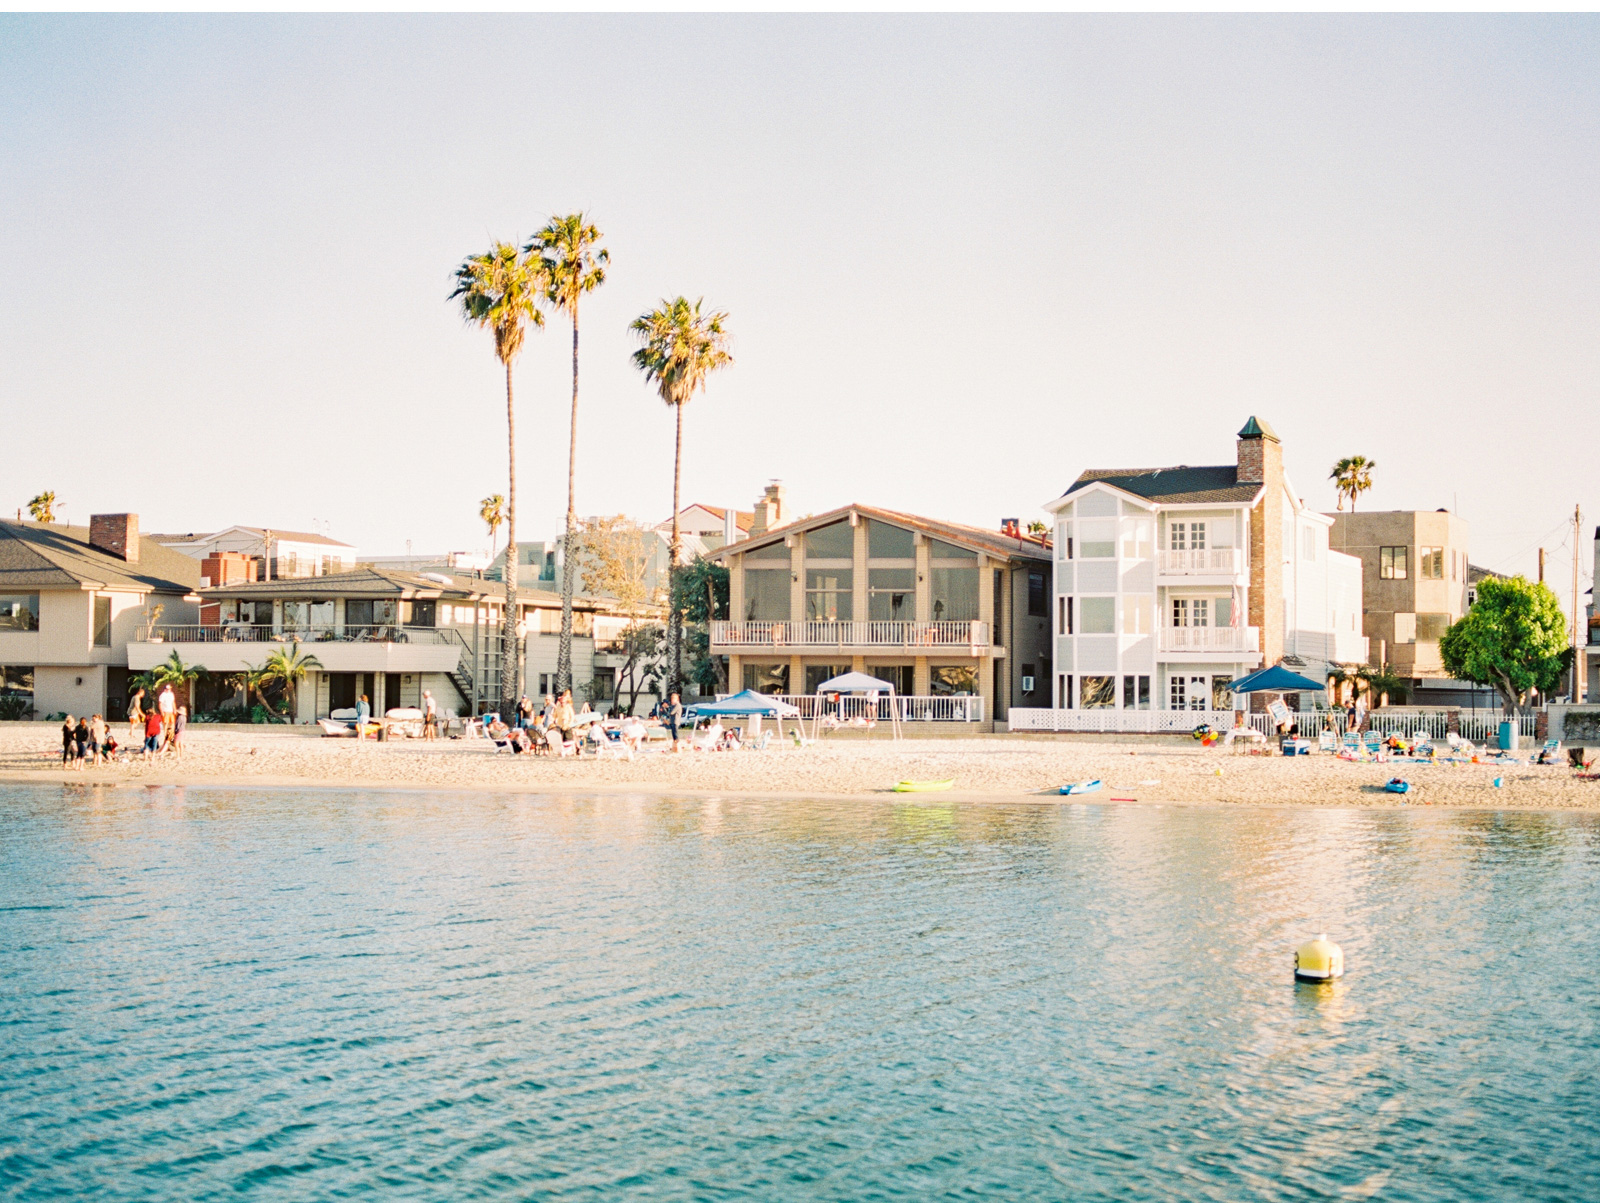 Anniversaries-on-the-Water-Long-Beach-Anniversary-Southern-California-Wedding-Photographer-Fine-Art-Wedding-Photos-Anniversary-on-Boat-Natalie-Schutt-Photography_05.jpg